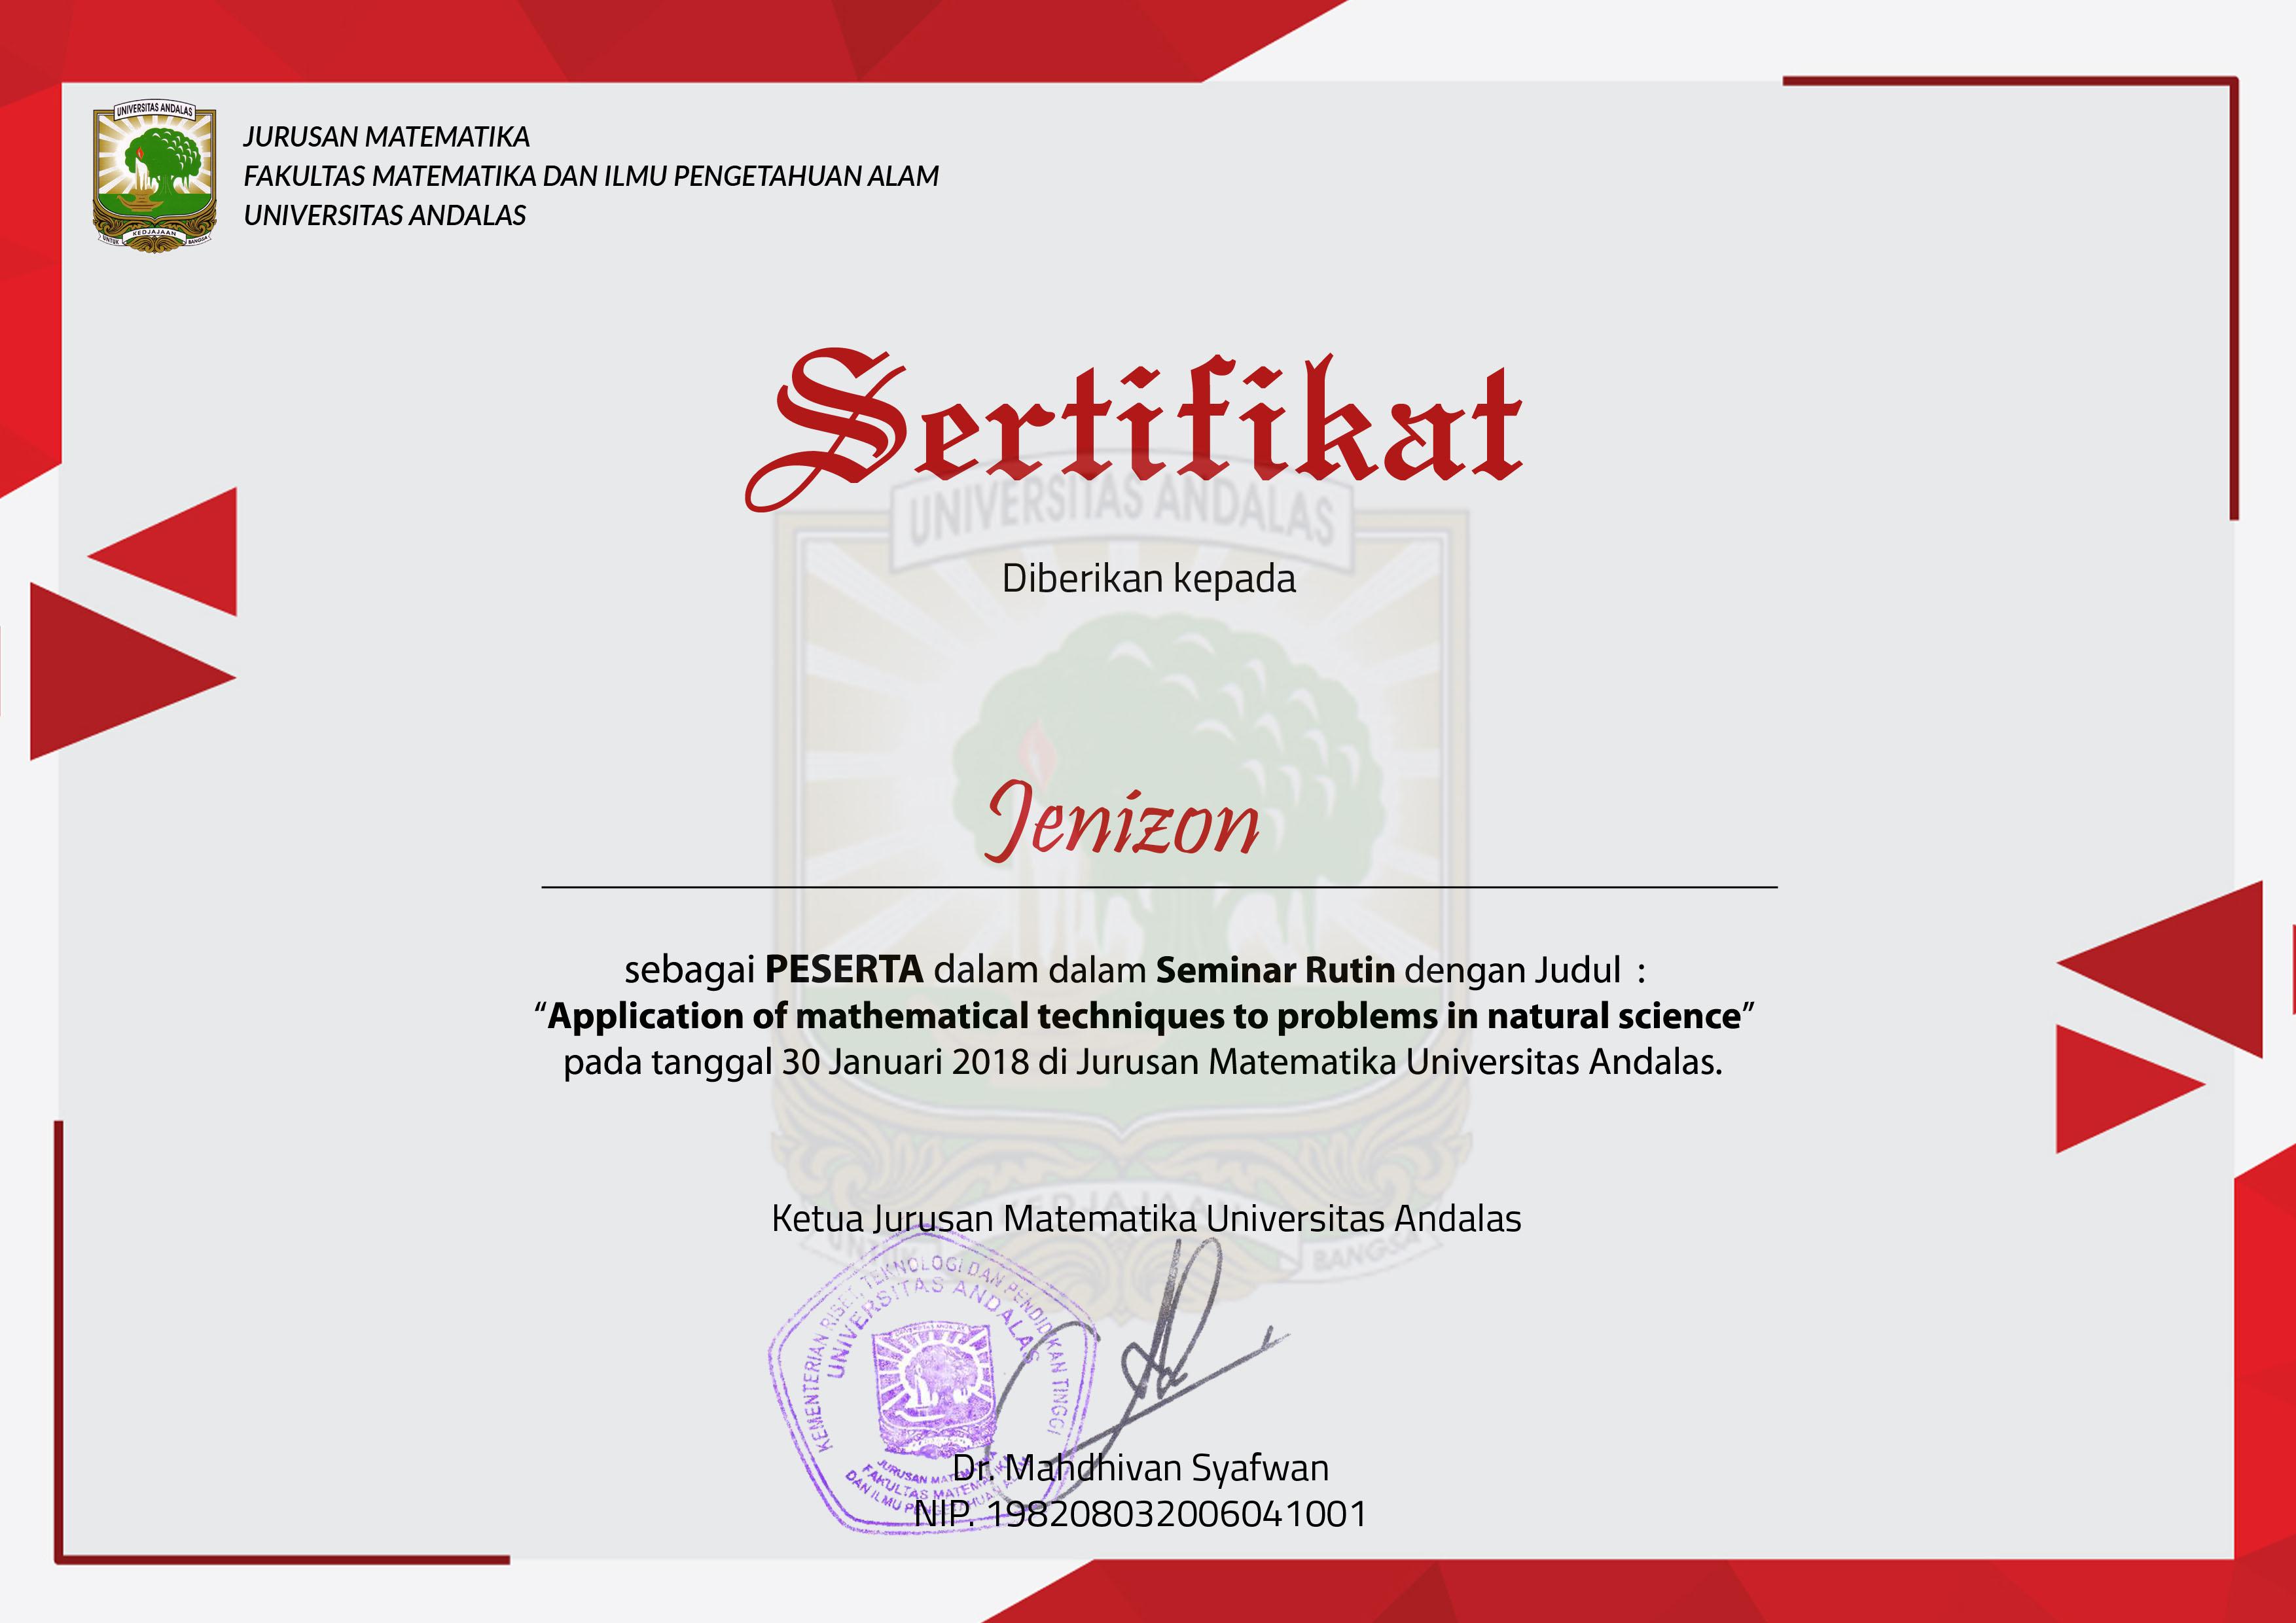 Sertifikat Seminar Rutin Application Of Mathematical Technics To